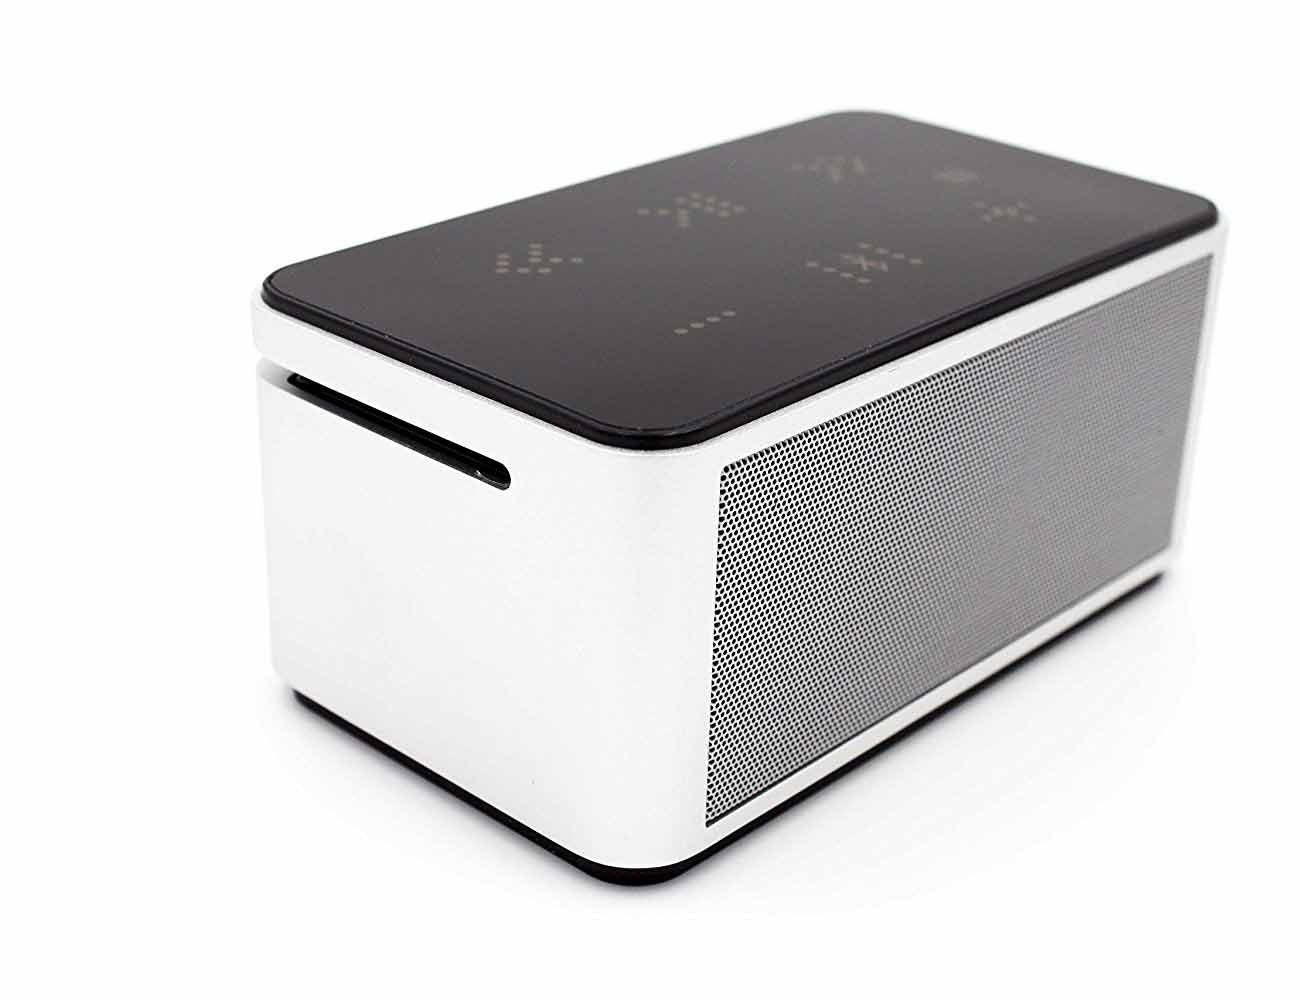 Paww SoundBox 10 Compact Bluetooth Speaker